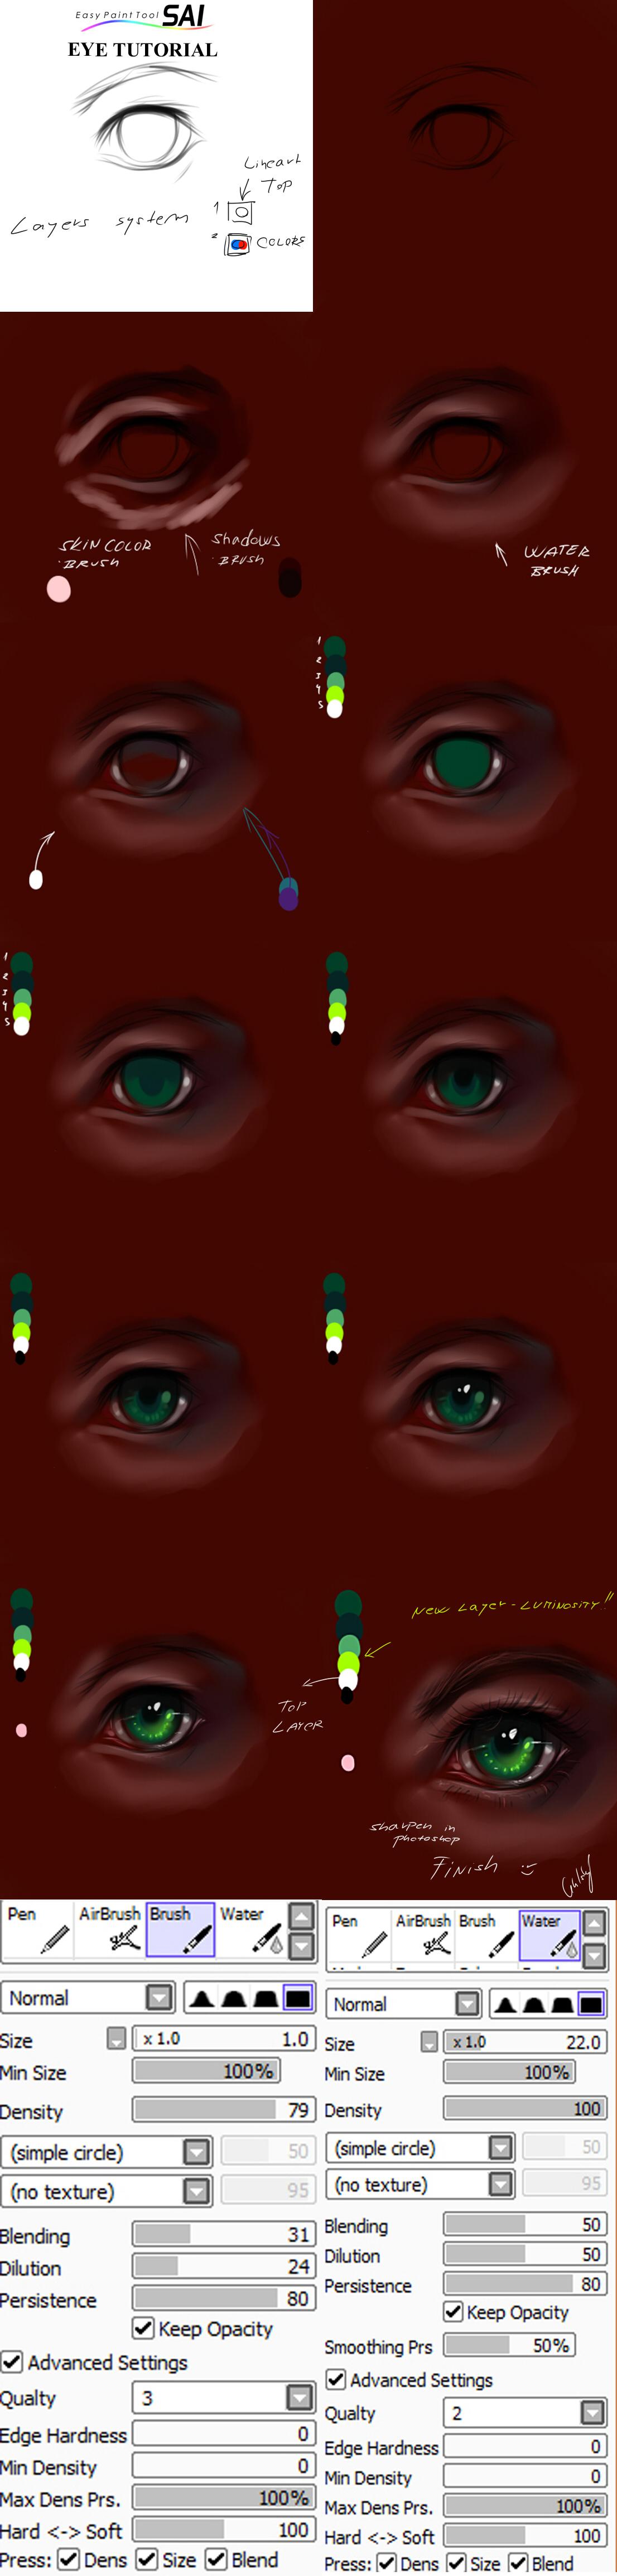 paint tool sai eyes tutorial by ryky on deviantart